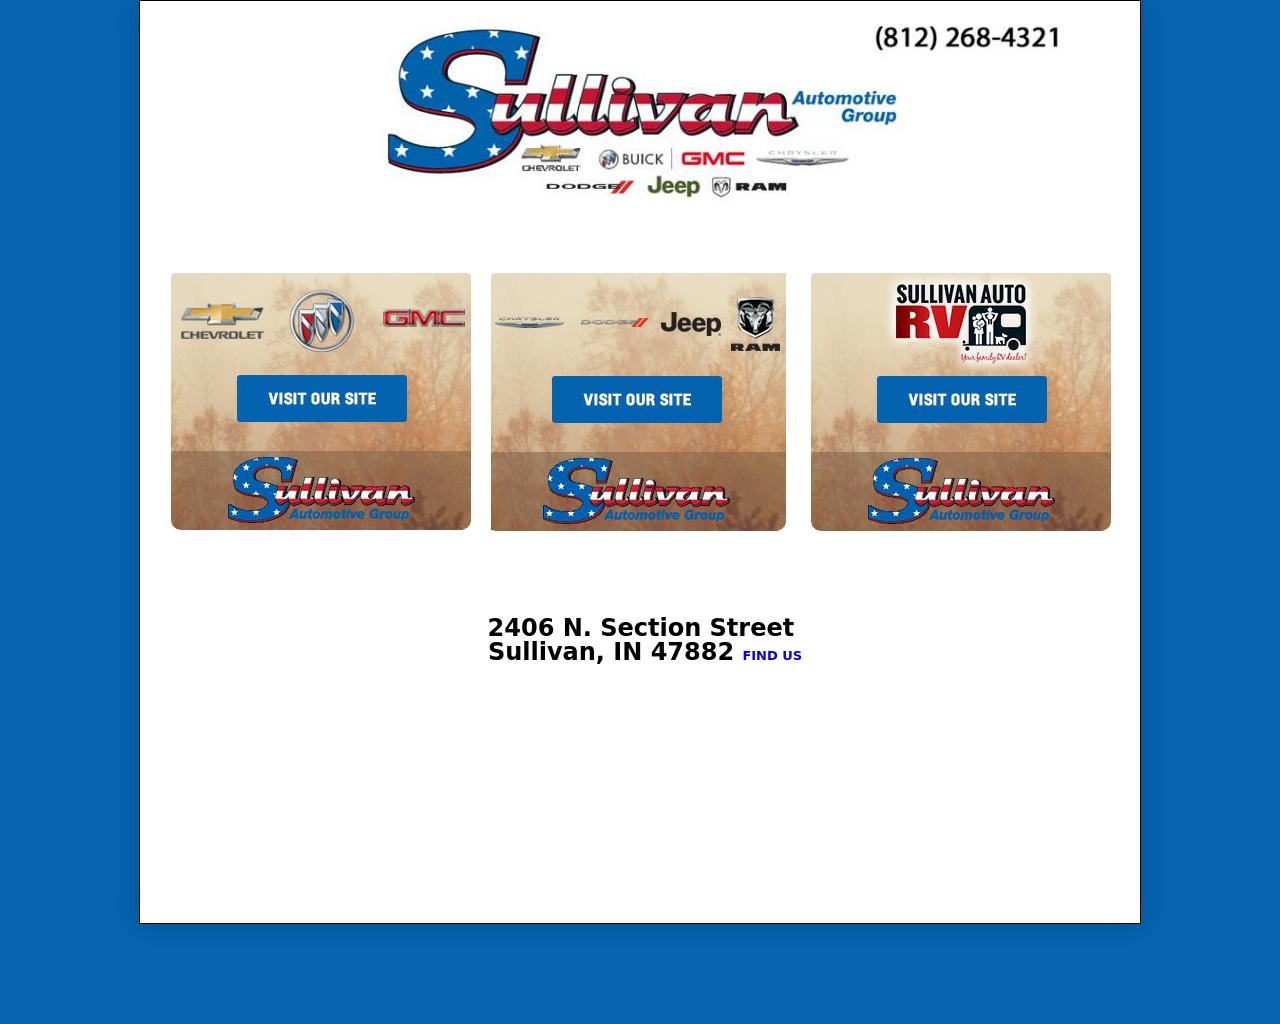 Sullivan-Automotive-Group-Advertising-Reviews-Pricing